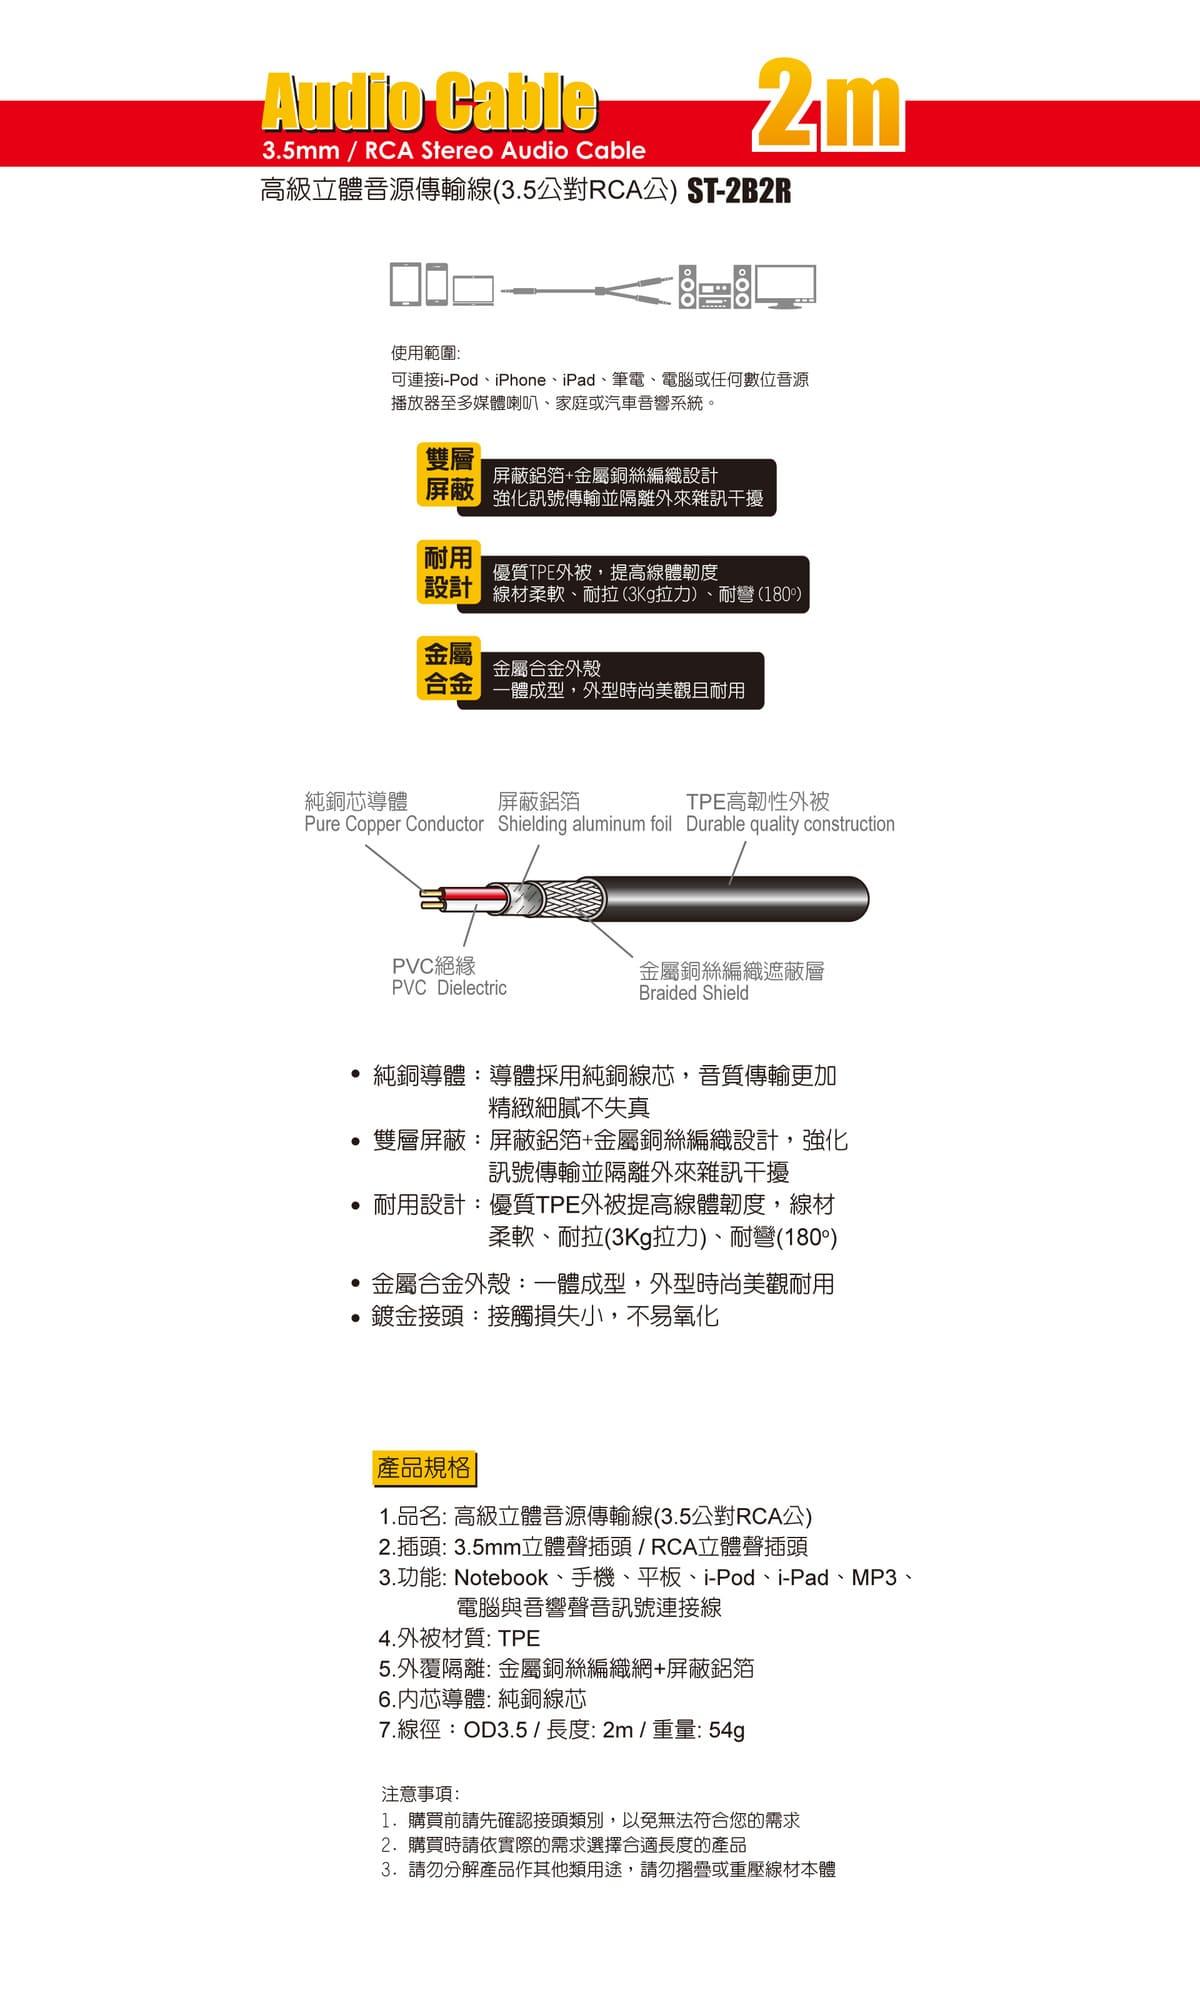 proimages/product/pro-02/pro06-006-音源線/ST-2B2R-02.jpg